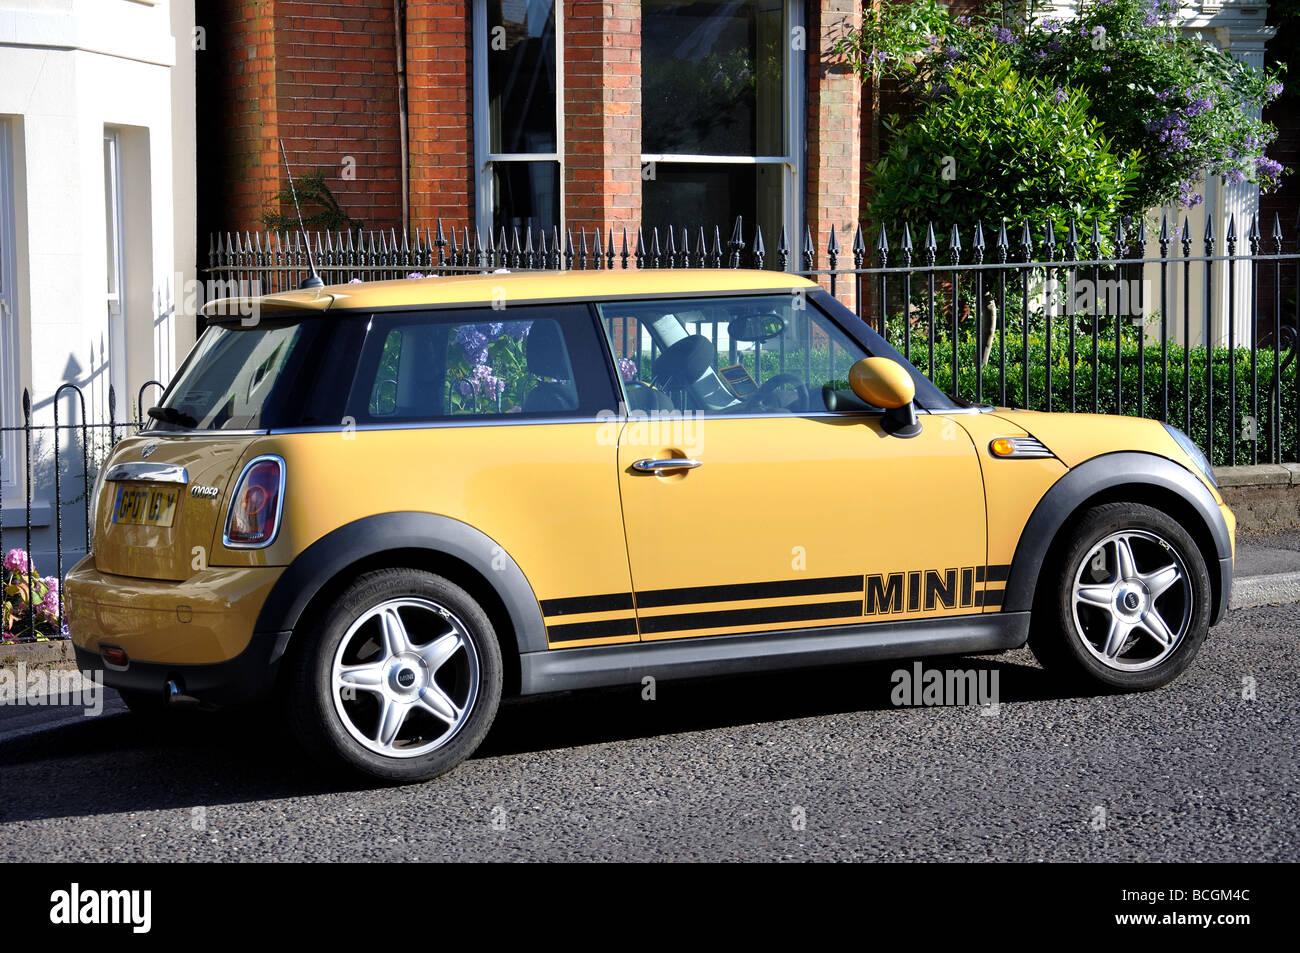 Yellow BMW Mini Cooper, High Street, Cranbrook, Kent, England, United Kingdom - Stock Image